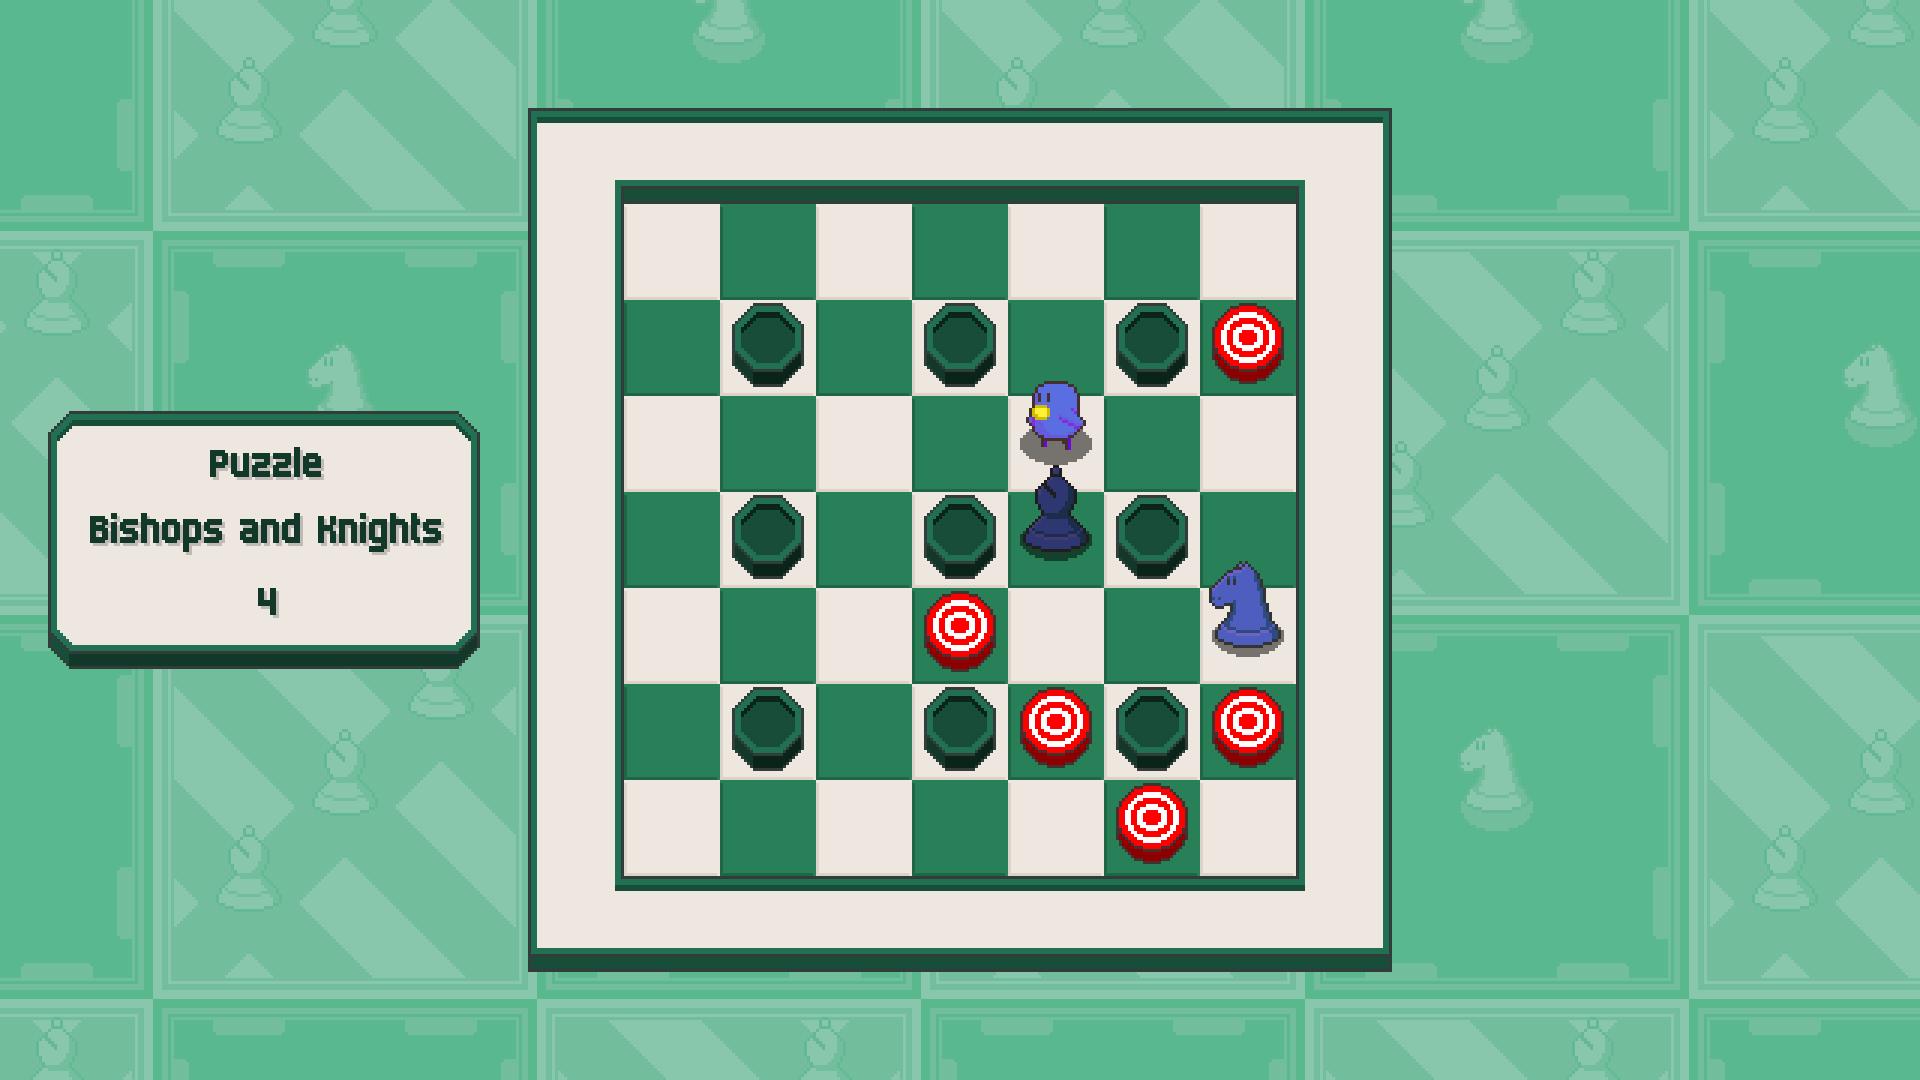 Chessplosion - Puzzle Solution Guide + Achievements Walkthrough - Grandblaster: Bishops and Knights - 49B60B2